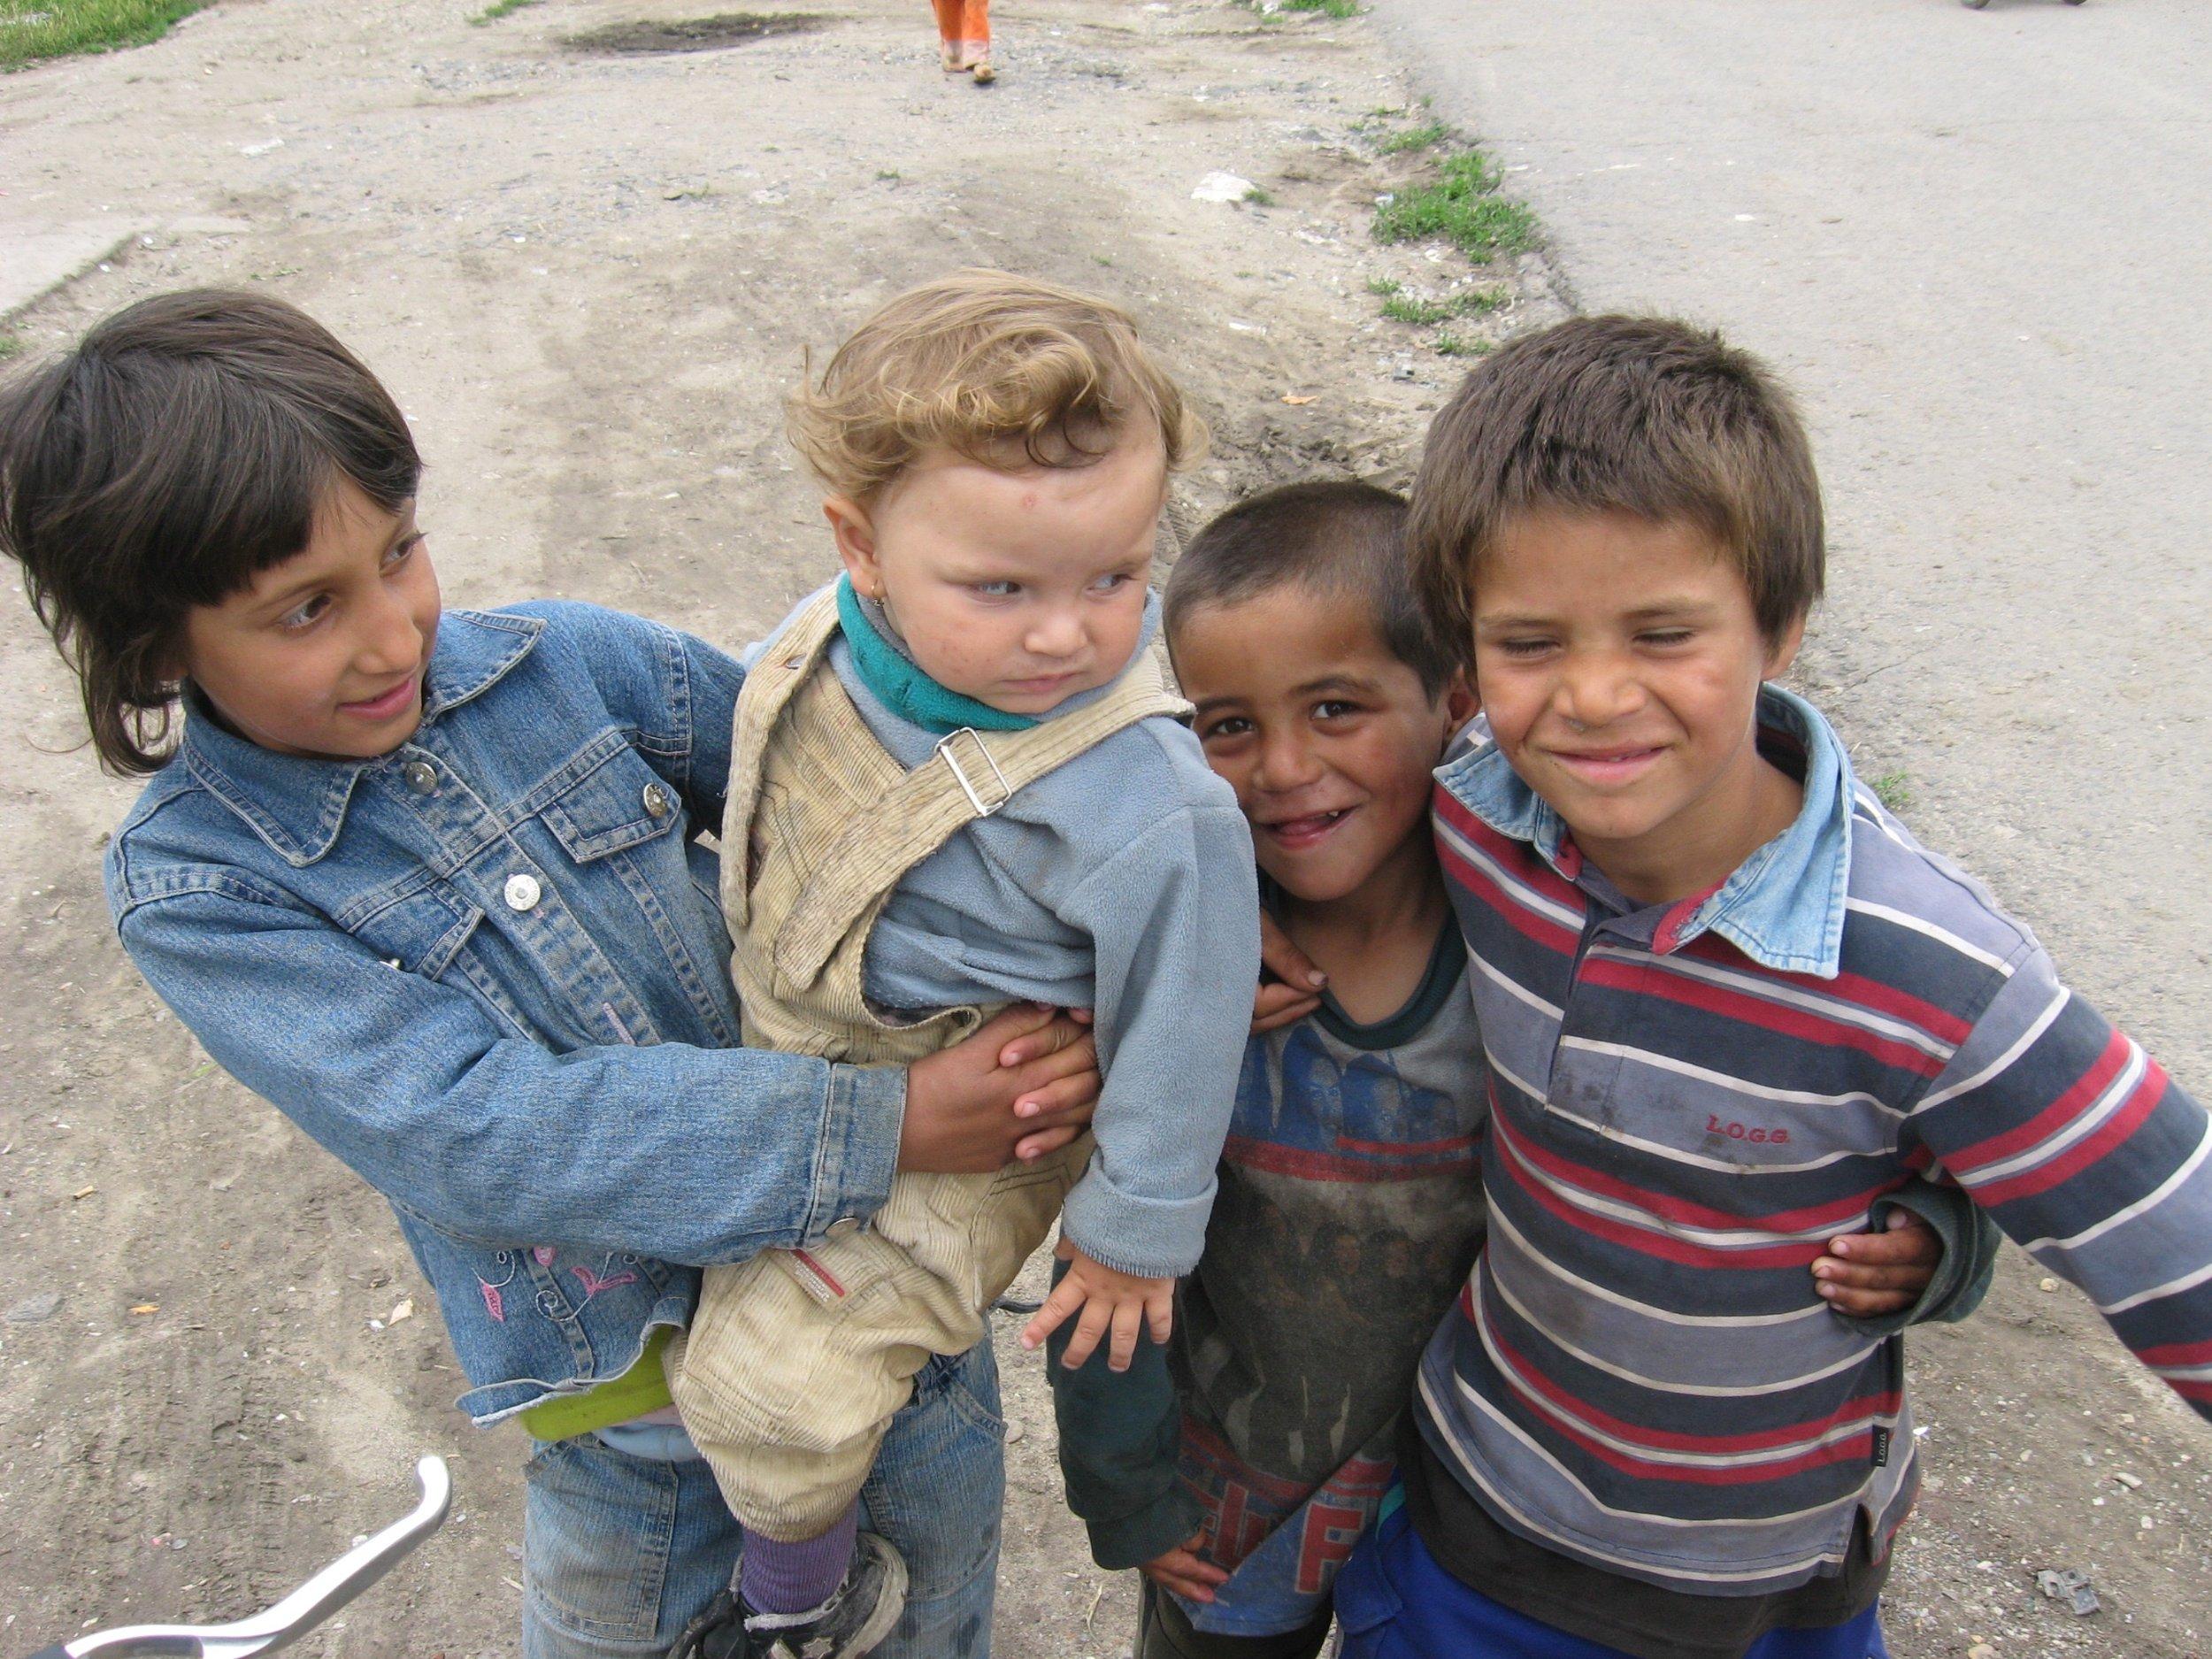 4 kids in ghetto.jpg